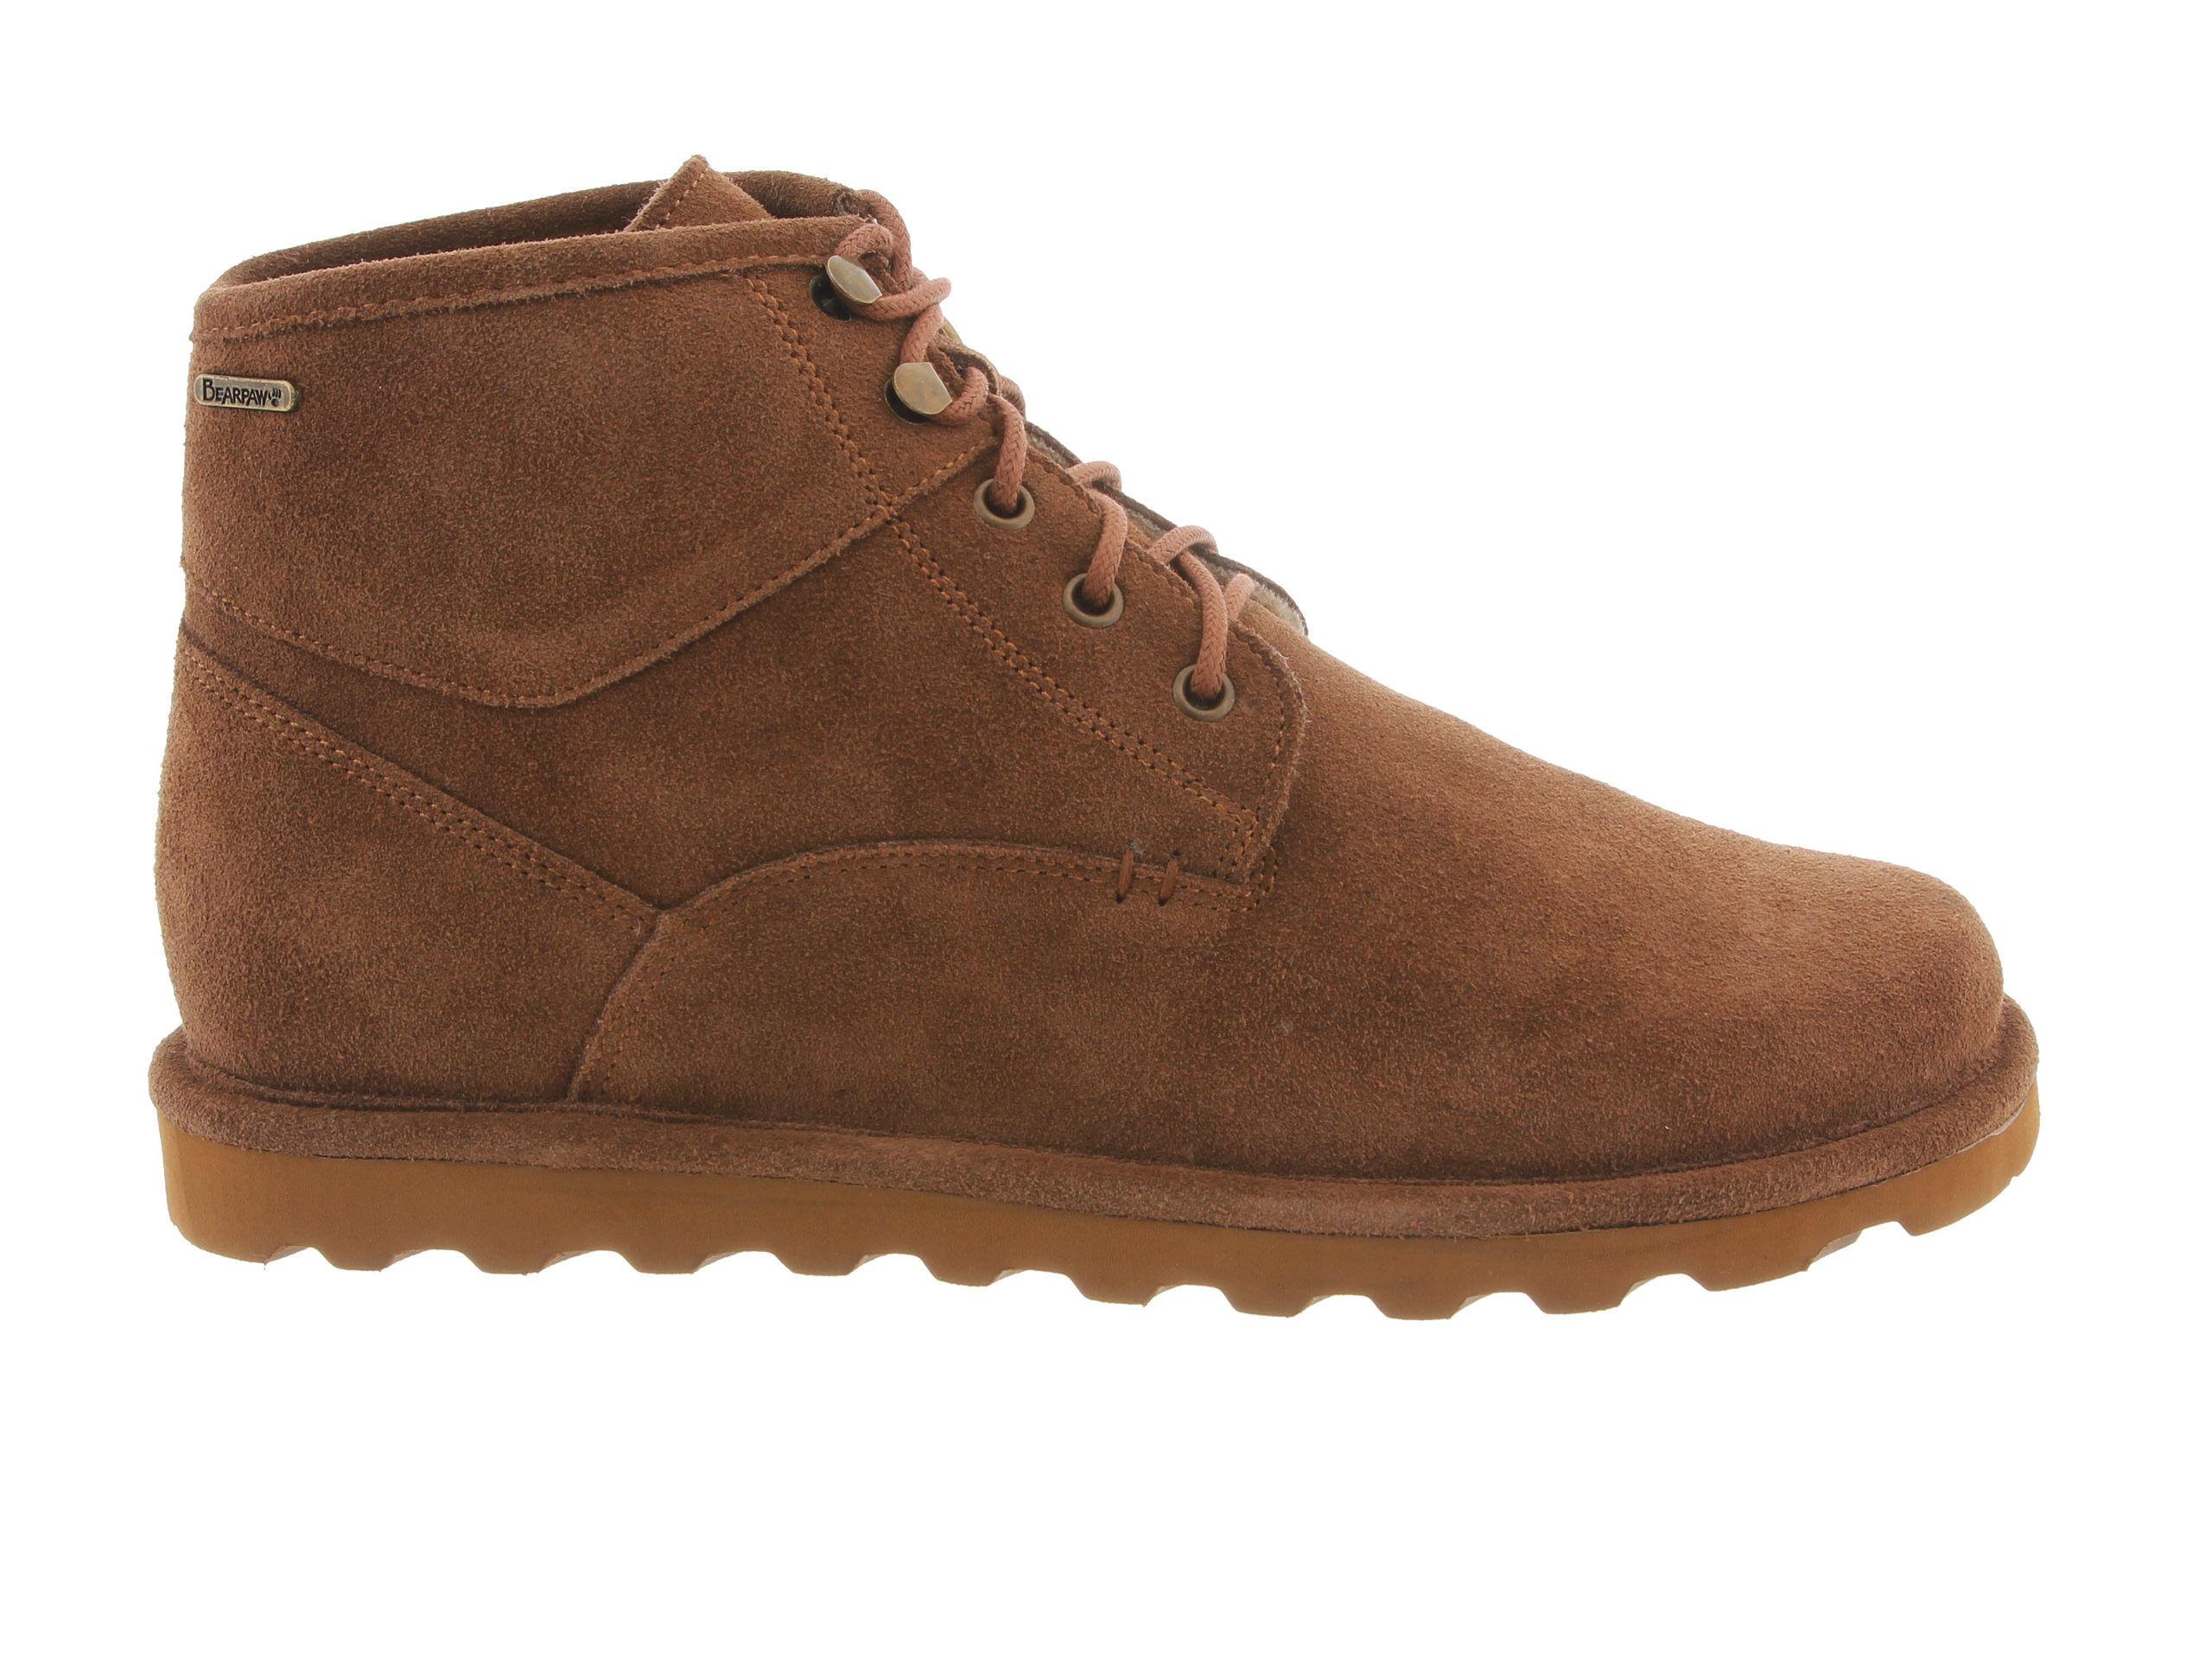 Men's Bearpaw Rueben Chukka Boots Hickory